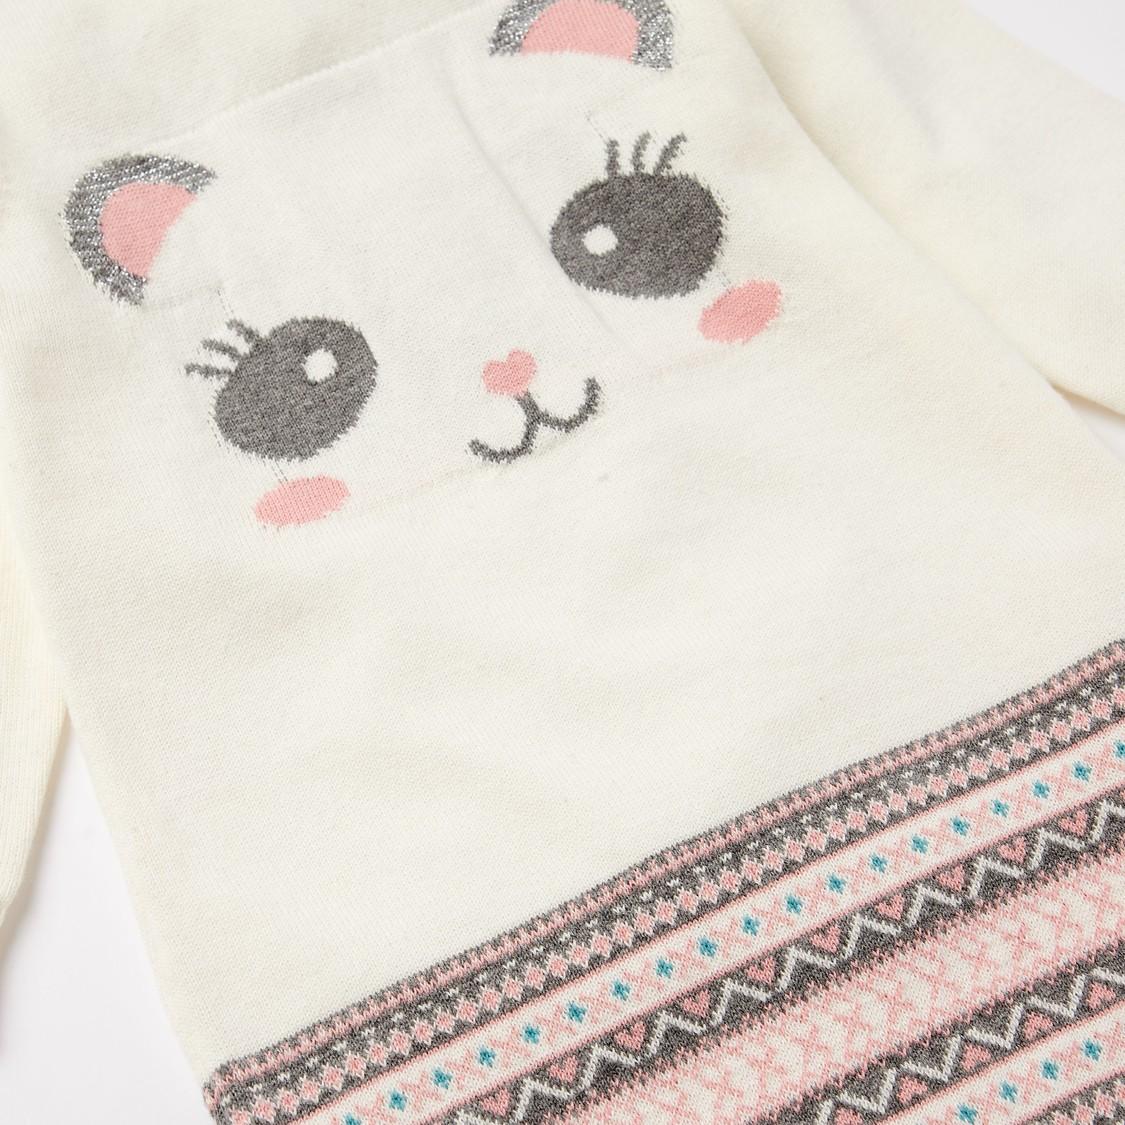 Panda Face Print Sweater Dress and Stockings Set